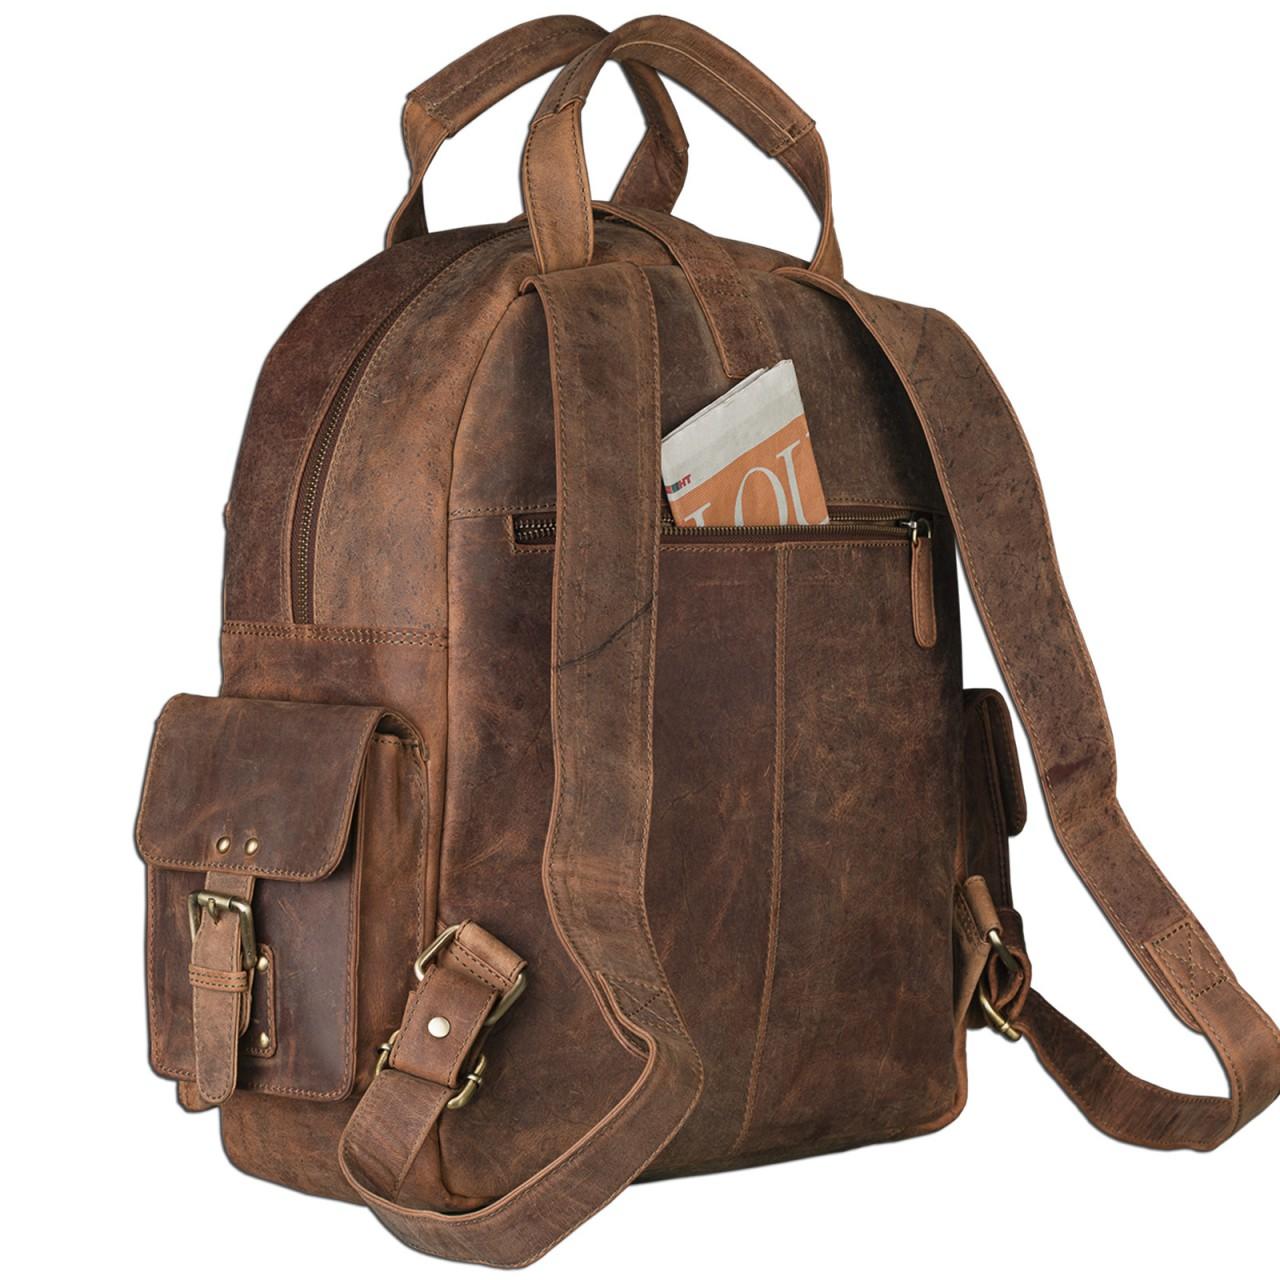 "STILORD ""Nevada"" Rucksack Leder groß im Vintage Design mit 13,3 Zoll Laptopfach Unisex Lederrucksack Uni Schule Lehrer Echtleder  - Bild 7"